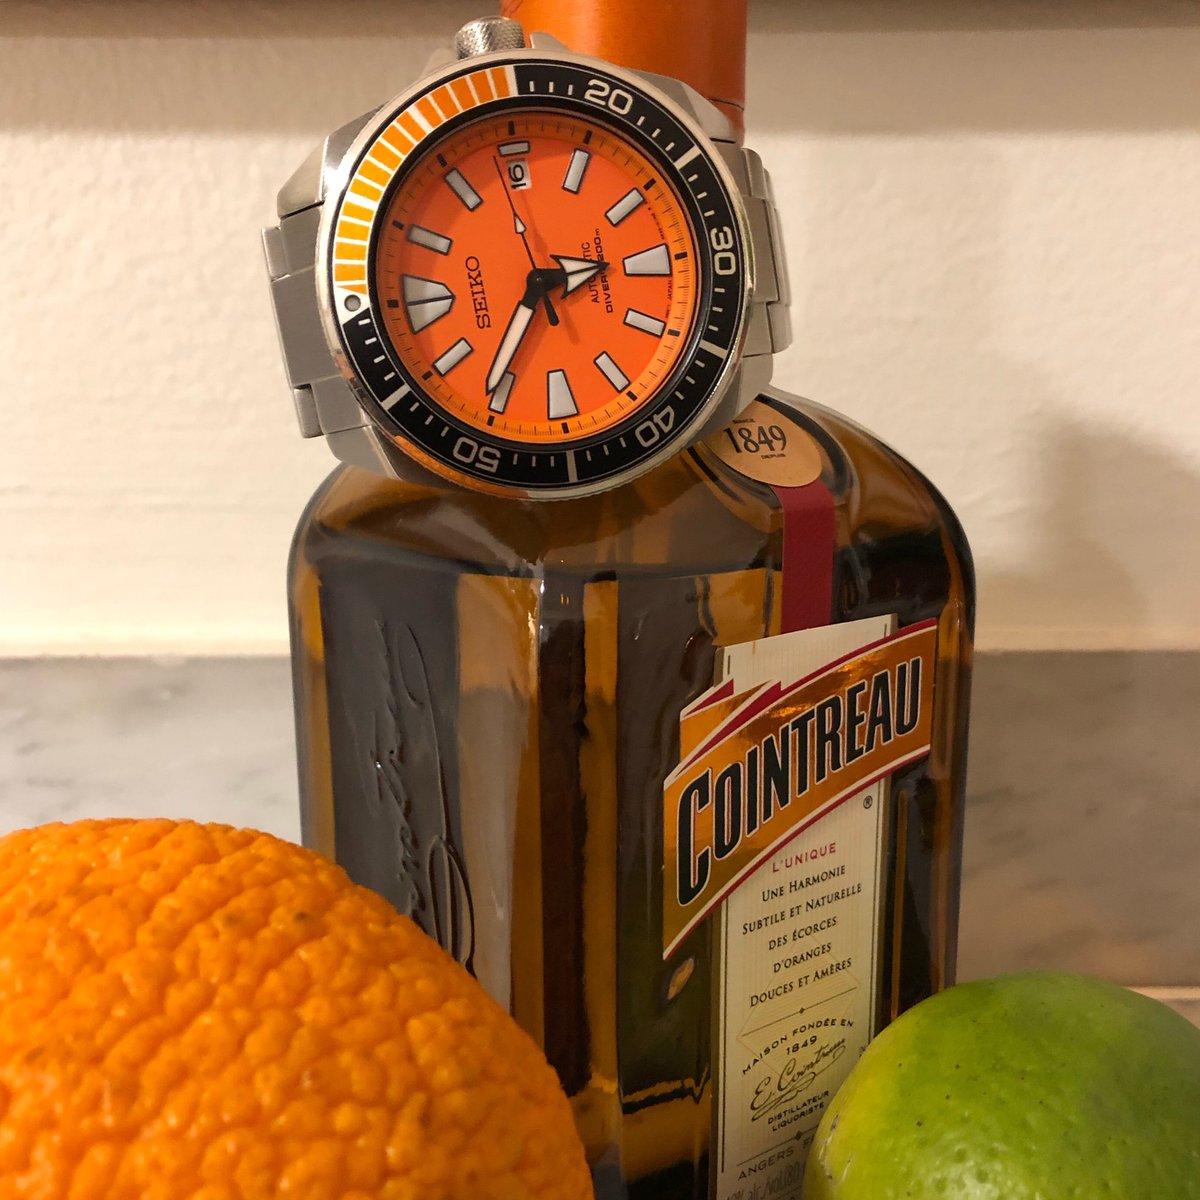 Fighting scurvy... the Orange Samurai with Cointreau and accoutrements: ref. Seiko SRPC07   #Seiko #SeikoSamurai #OrangeSamurai #SRPC07 #cointreau @seikowatches https://t.co/6FON20gWrZ